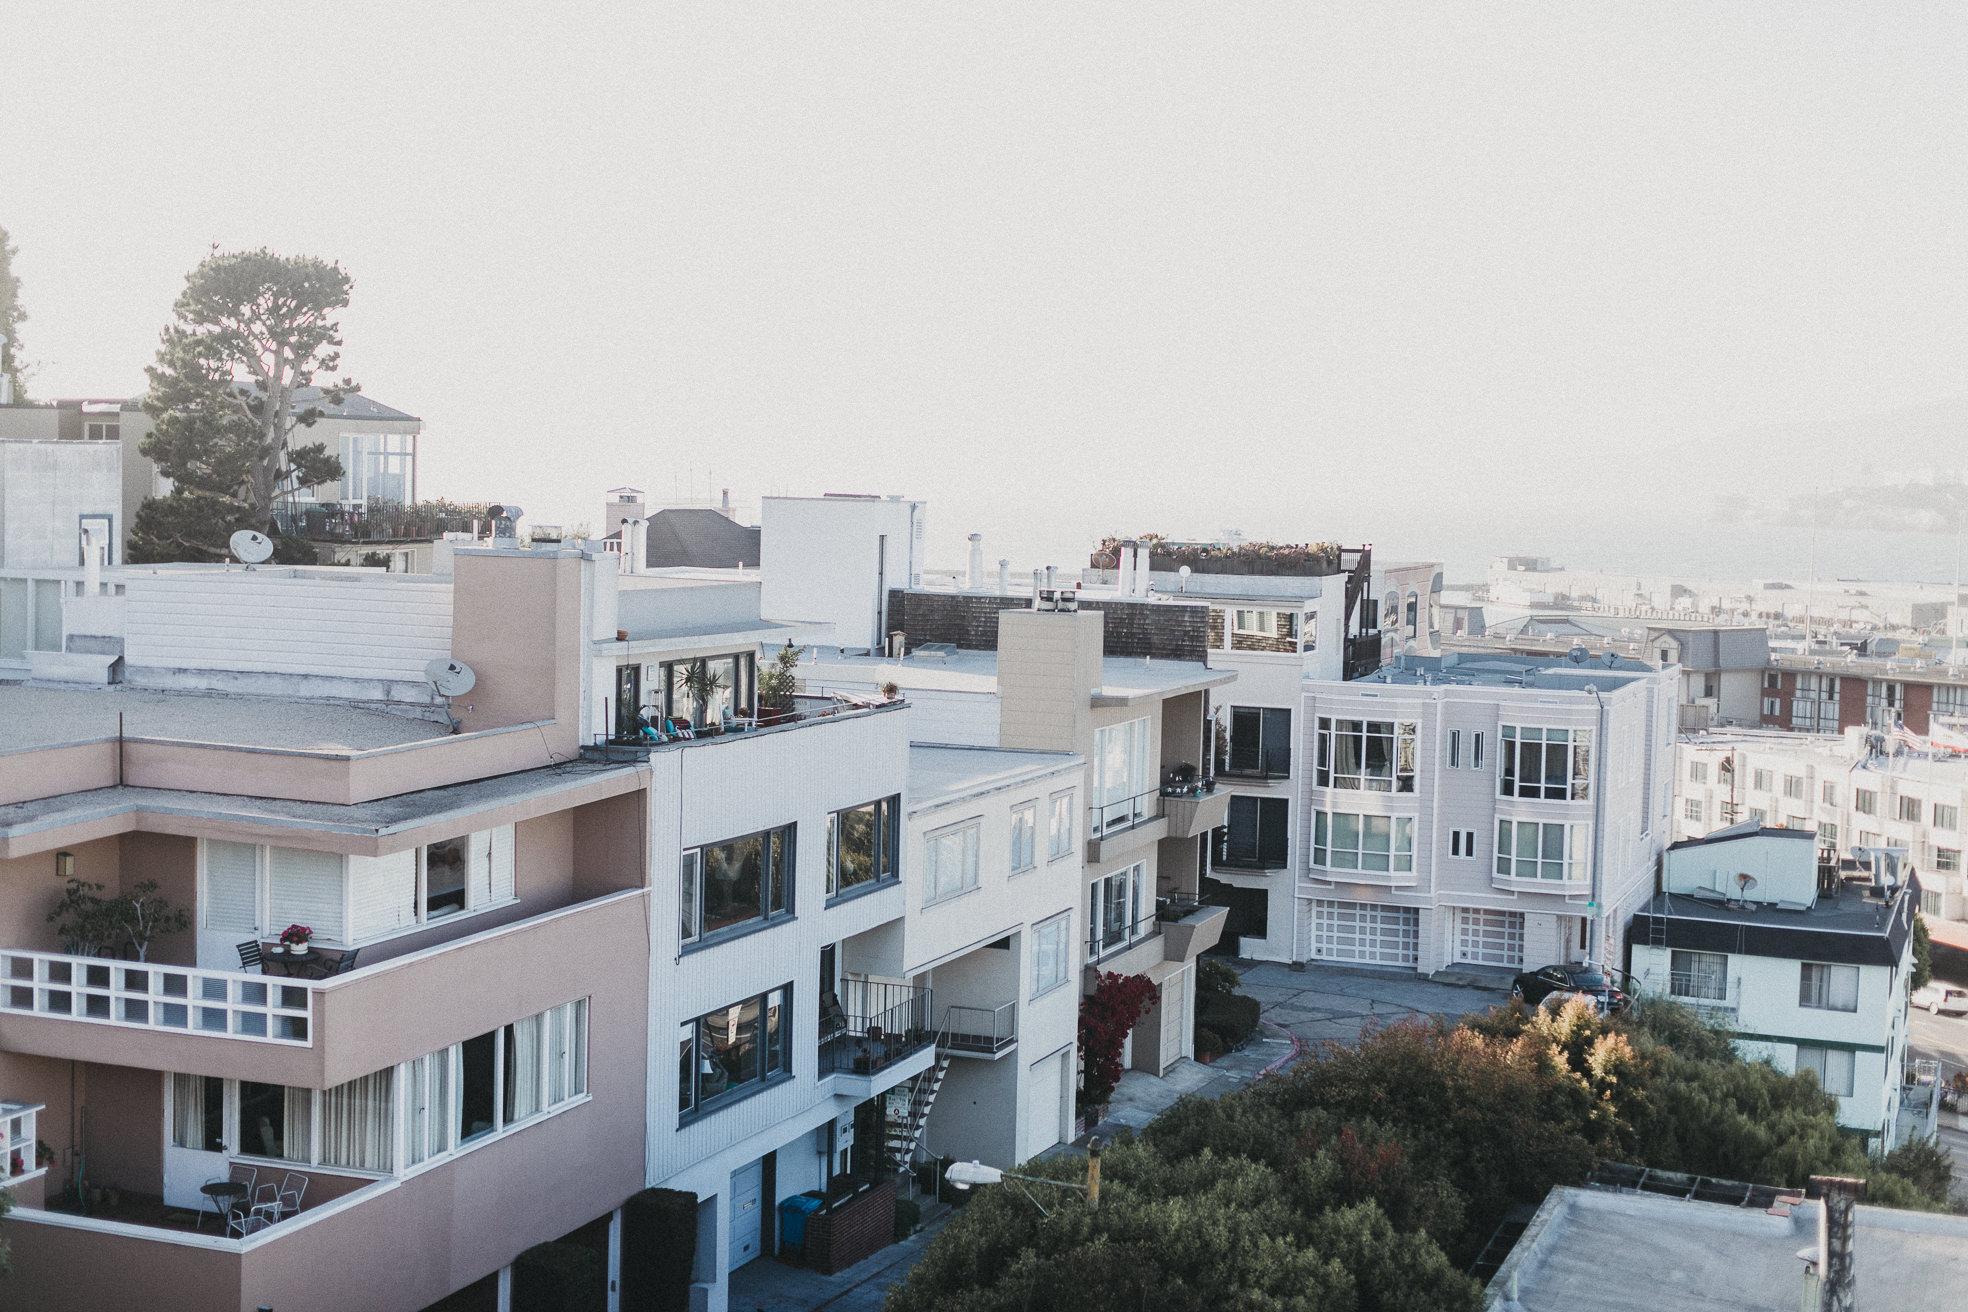 San-Francisco-BildervomLeben-8782